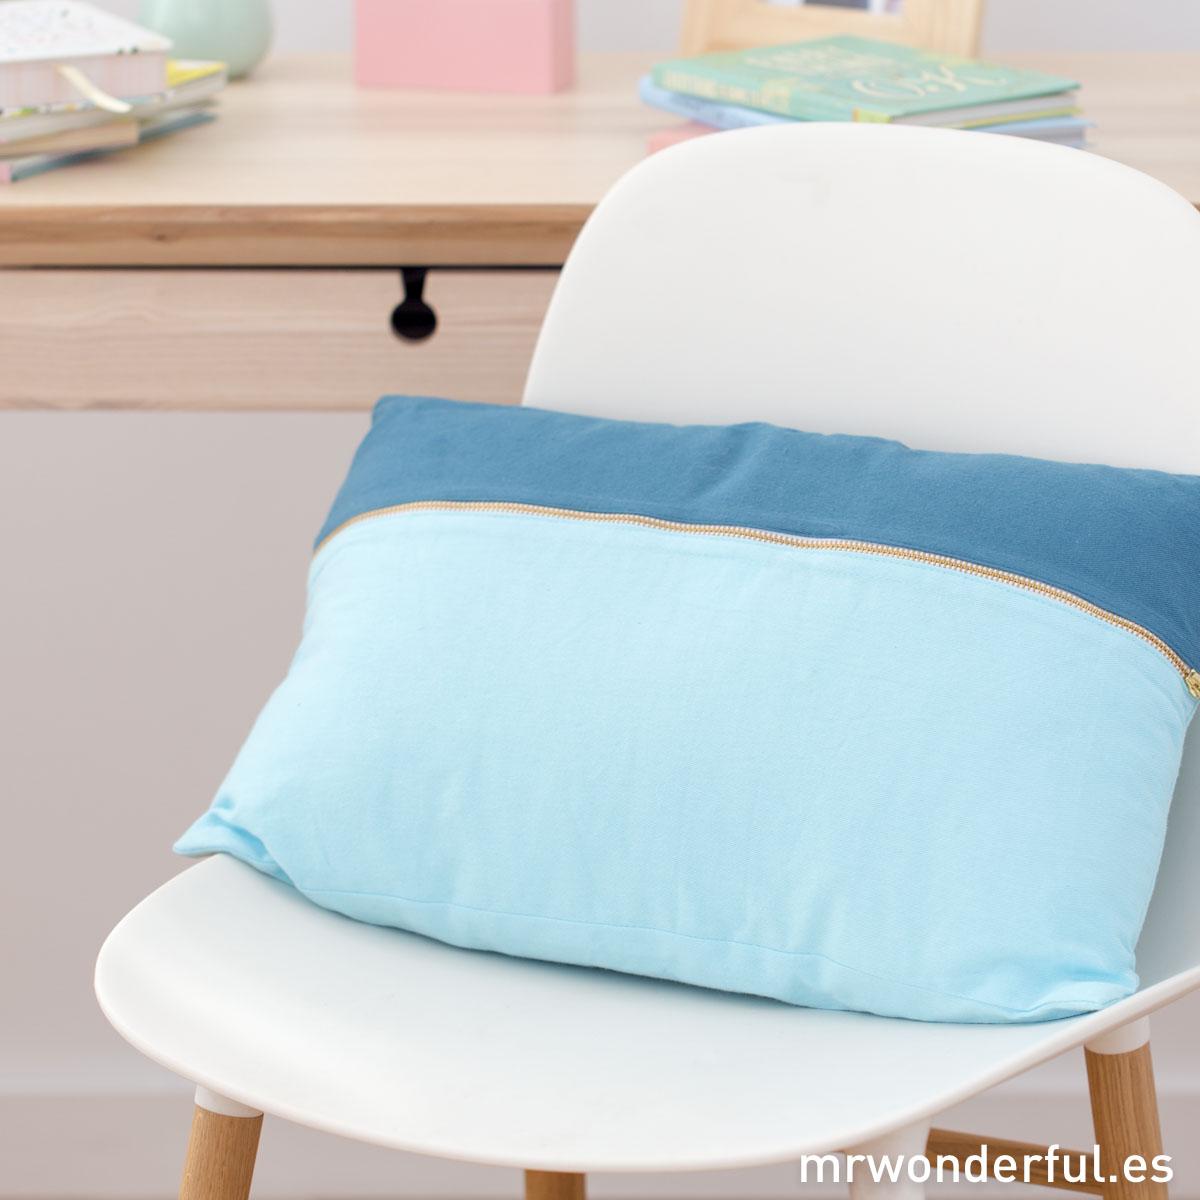 mrwonderful_PRA02881_Cojin-duo-rectangular-azul-y-mint-1-Editar